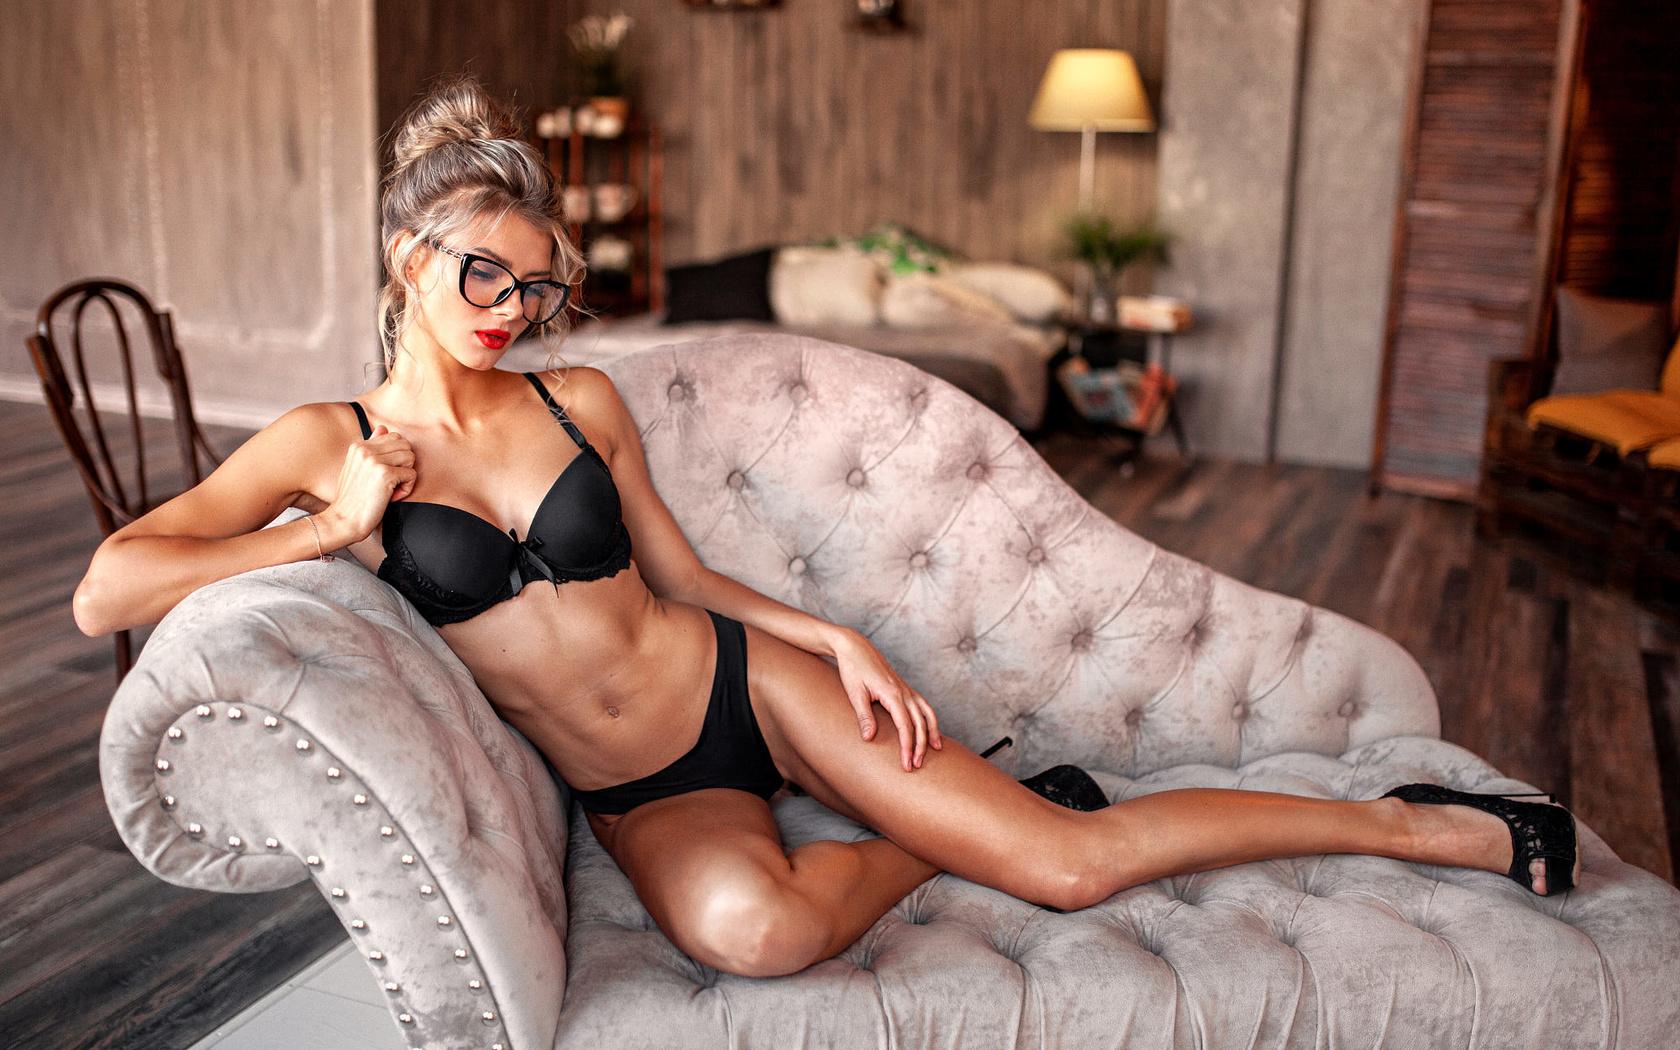 women, blonde, brunette, red lipstick, high heels, black lingerie, sitting, belly, women with glasses, lamp, chair, алексей юрьев ,alexey yuryev